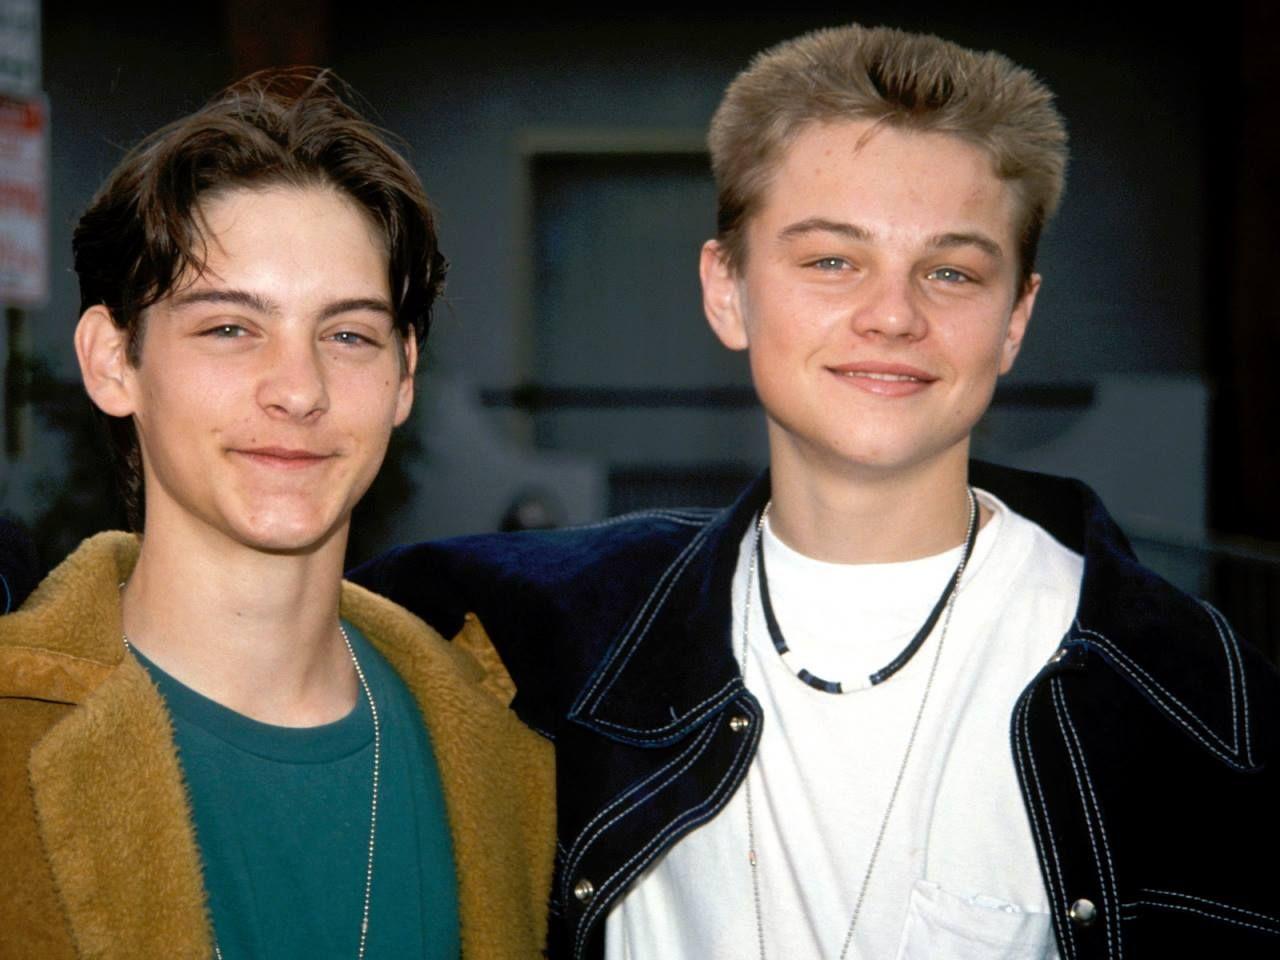 Tobey Maguire & Leonardo DiCaprio | Leonardo dicaprio, Yesterday and today, Tobey  maguire leonardo dicaprio